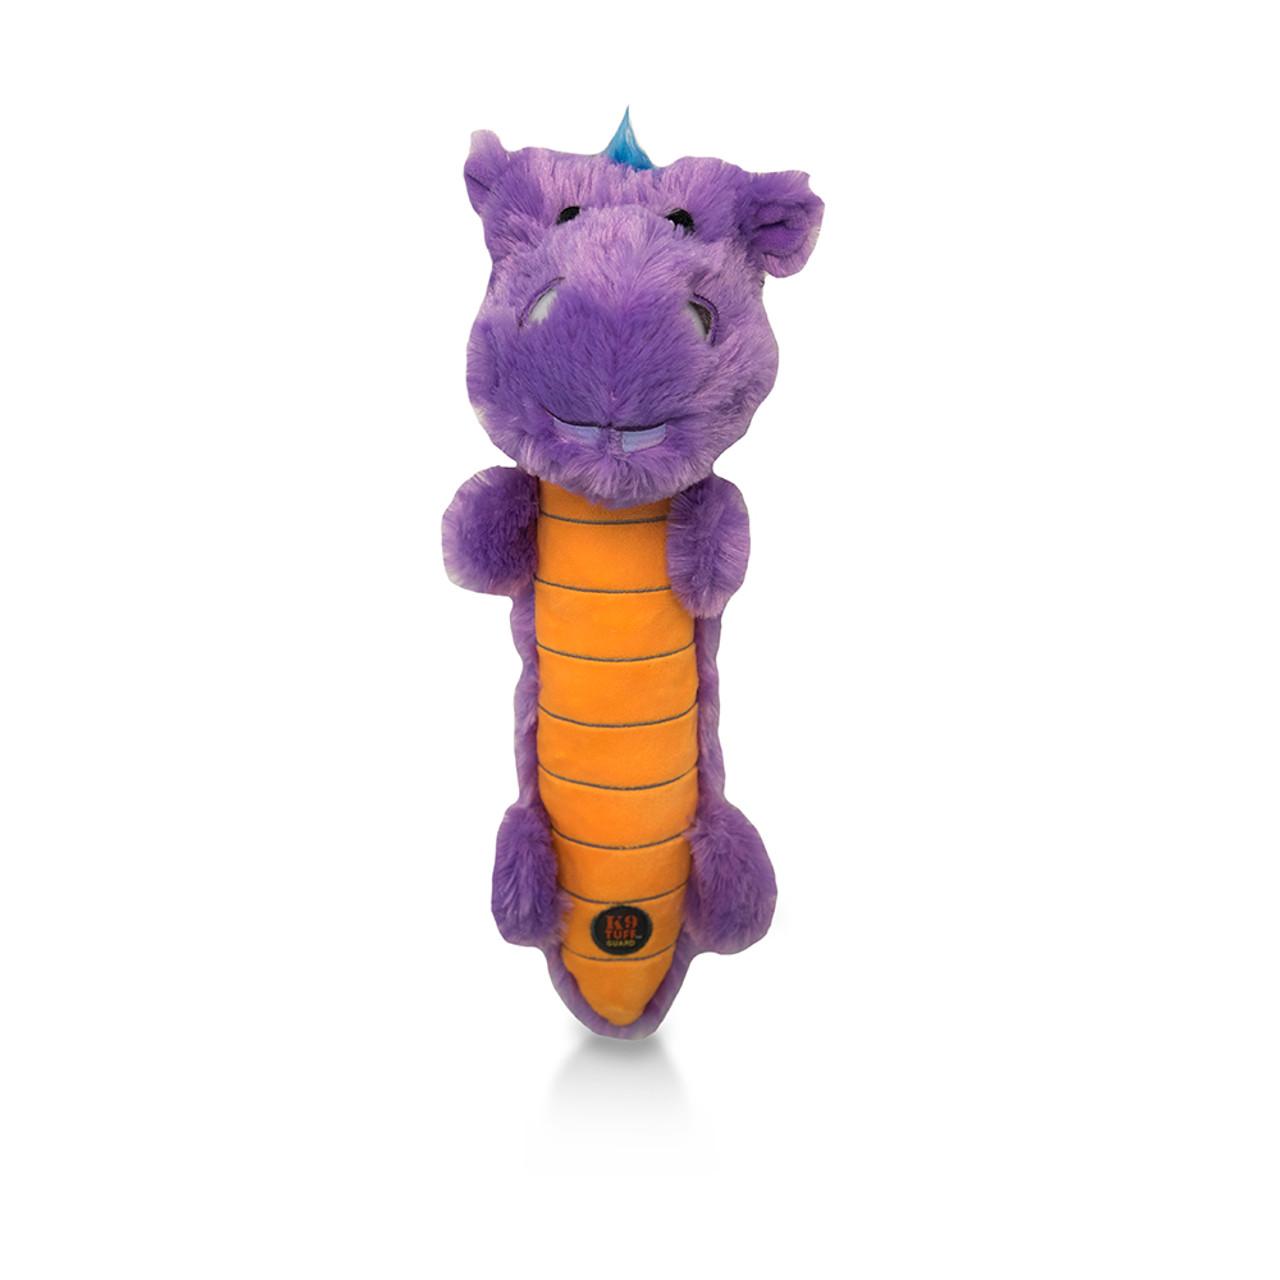 Charming Light Ups Purple Hippo Plush Dog Toy